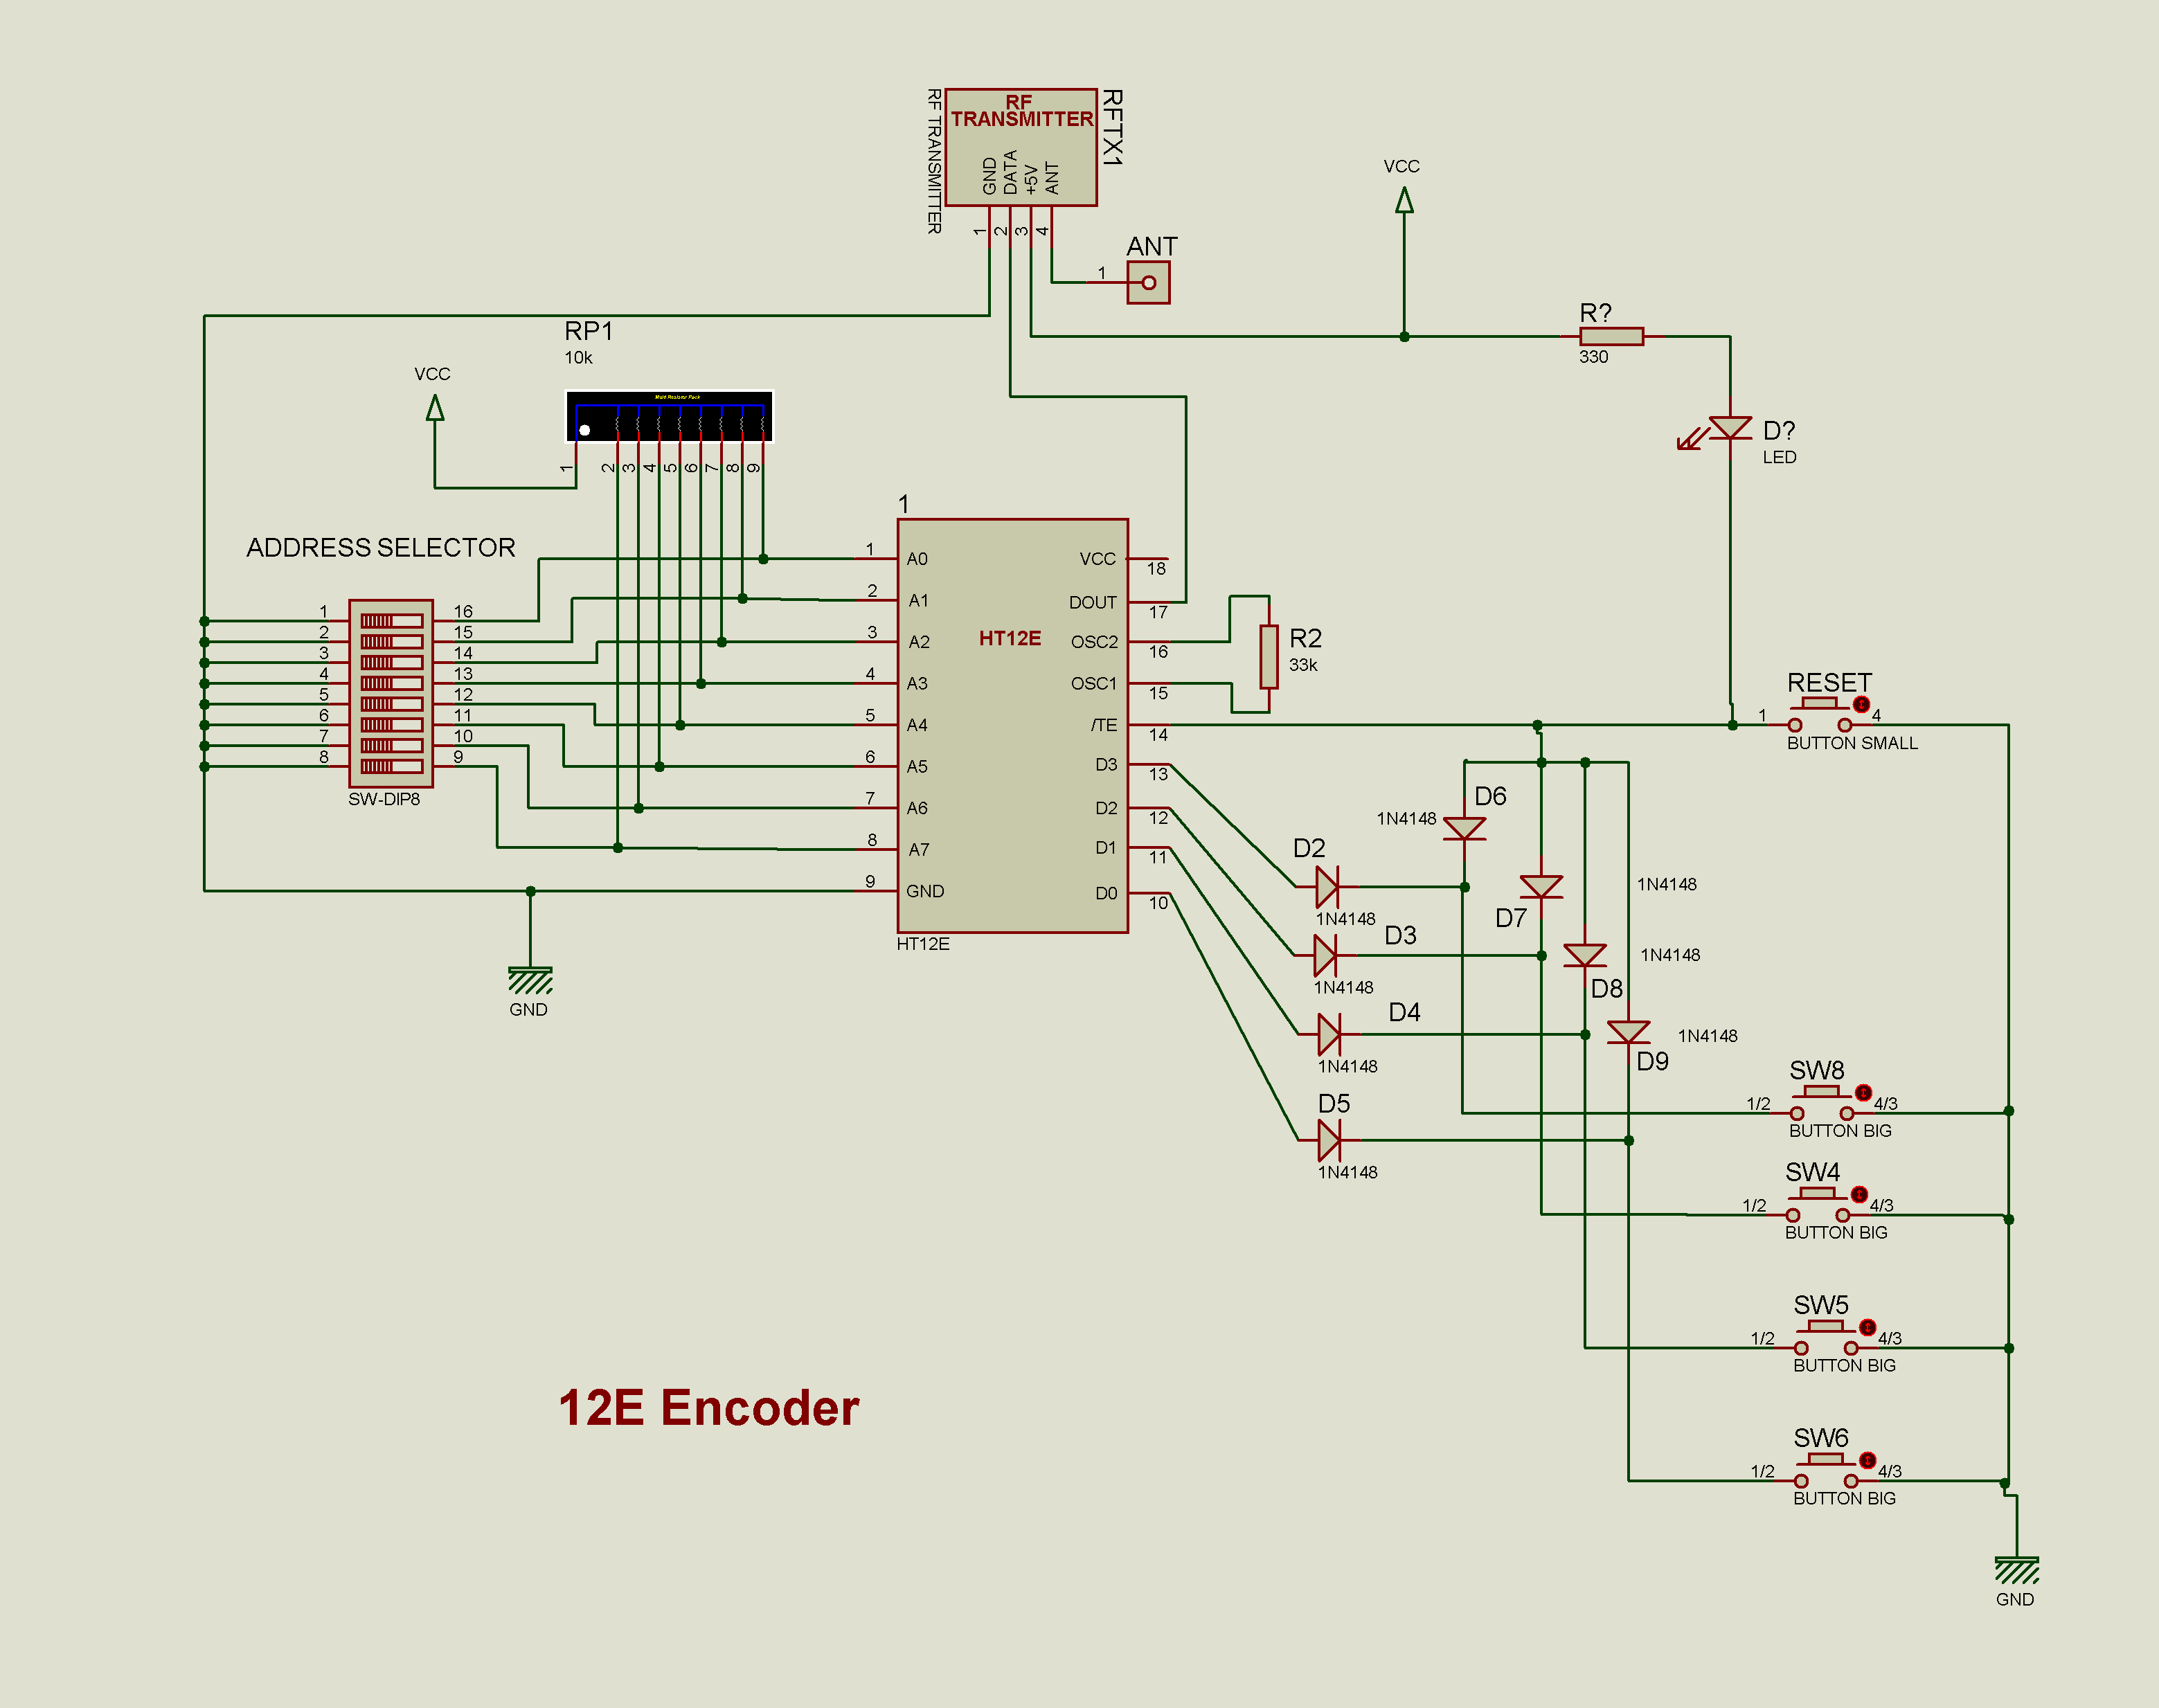 Ht12e  U0026 Ht12d Circuit Help Please